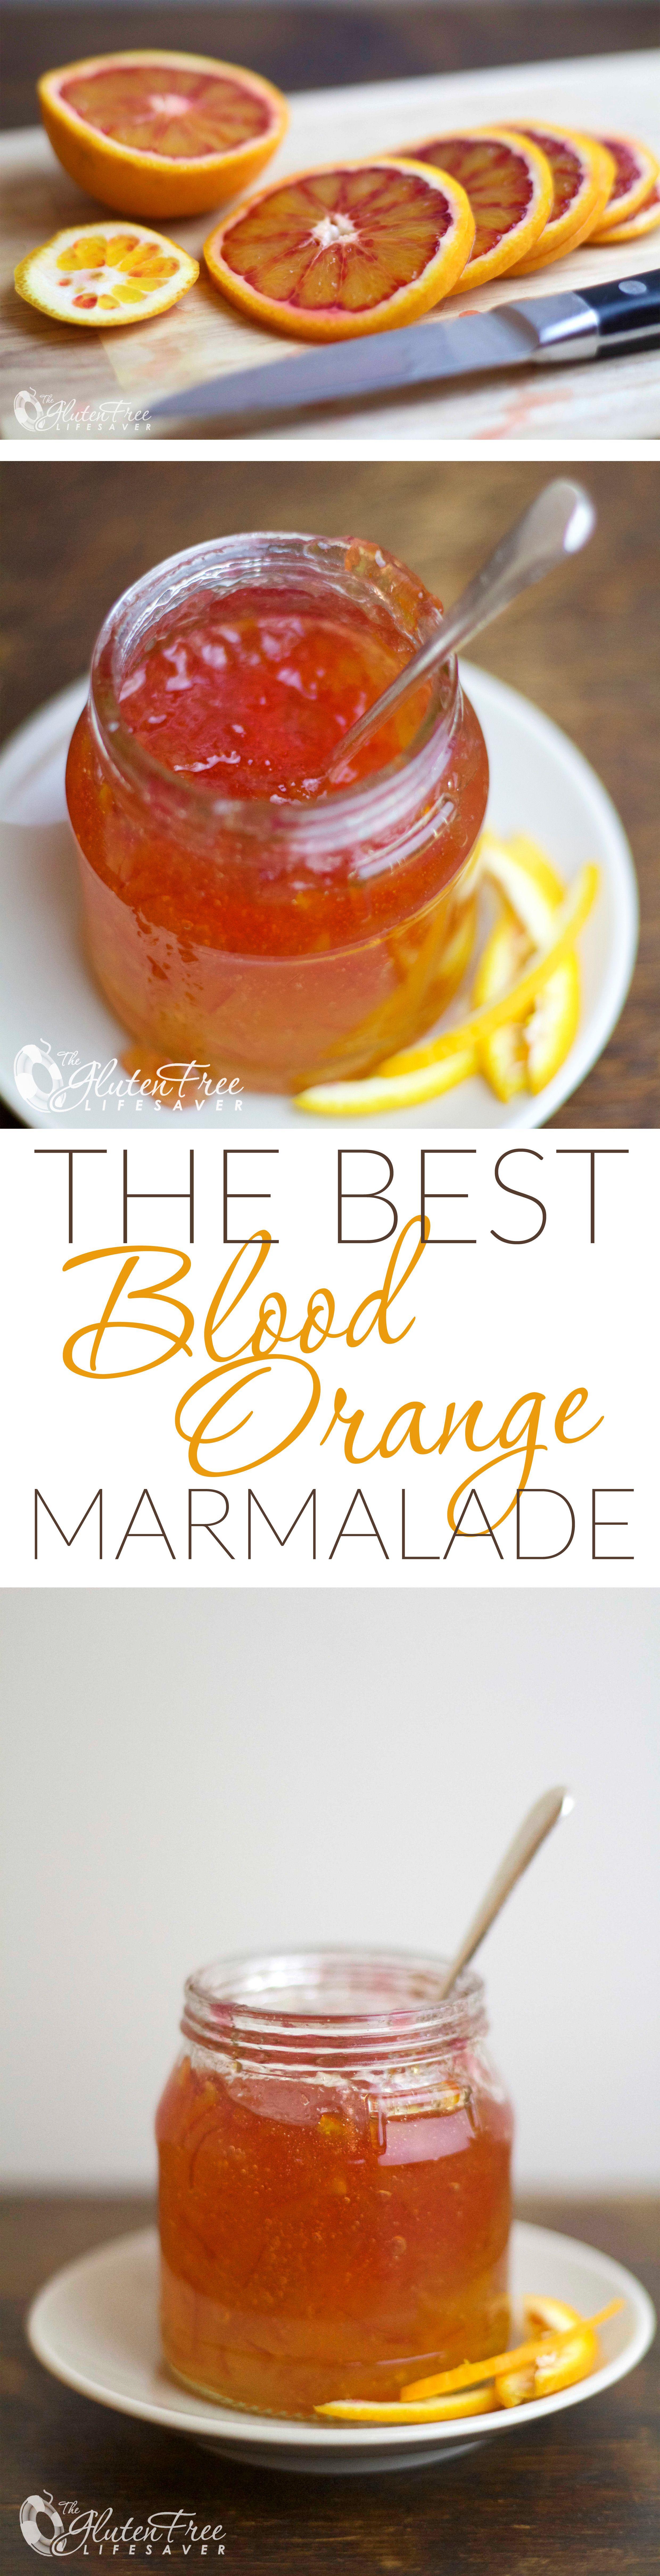 Wonderful Homemade Blood Orange Marmalade Recipe The World's Best Homemade Blood Orange Marmalade